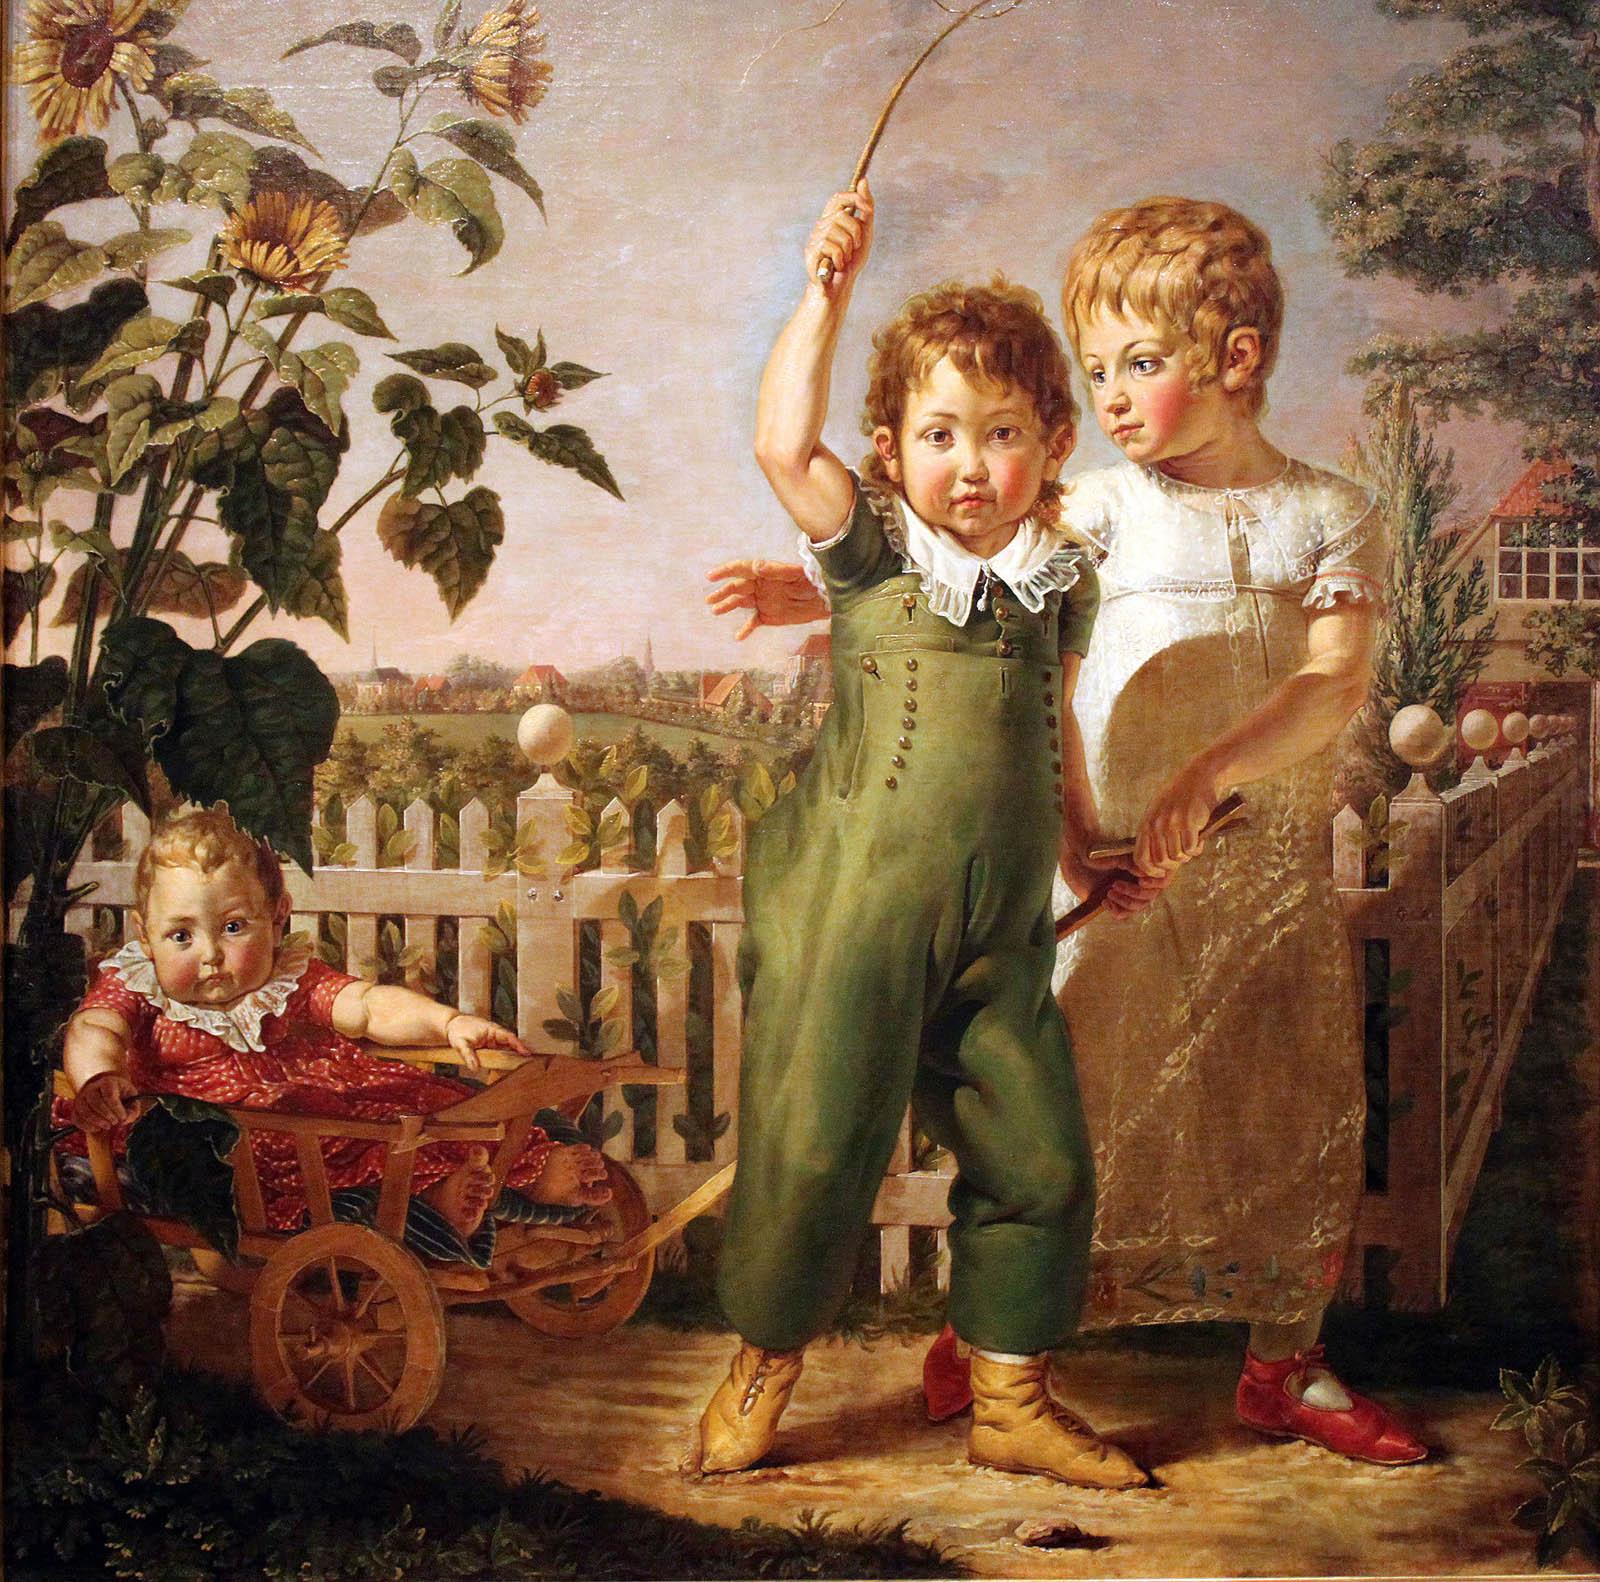 I_bambini_di_H_C3_BClsenbeck_di_Philipp_Otto_Runge_.jpg?1550224745